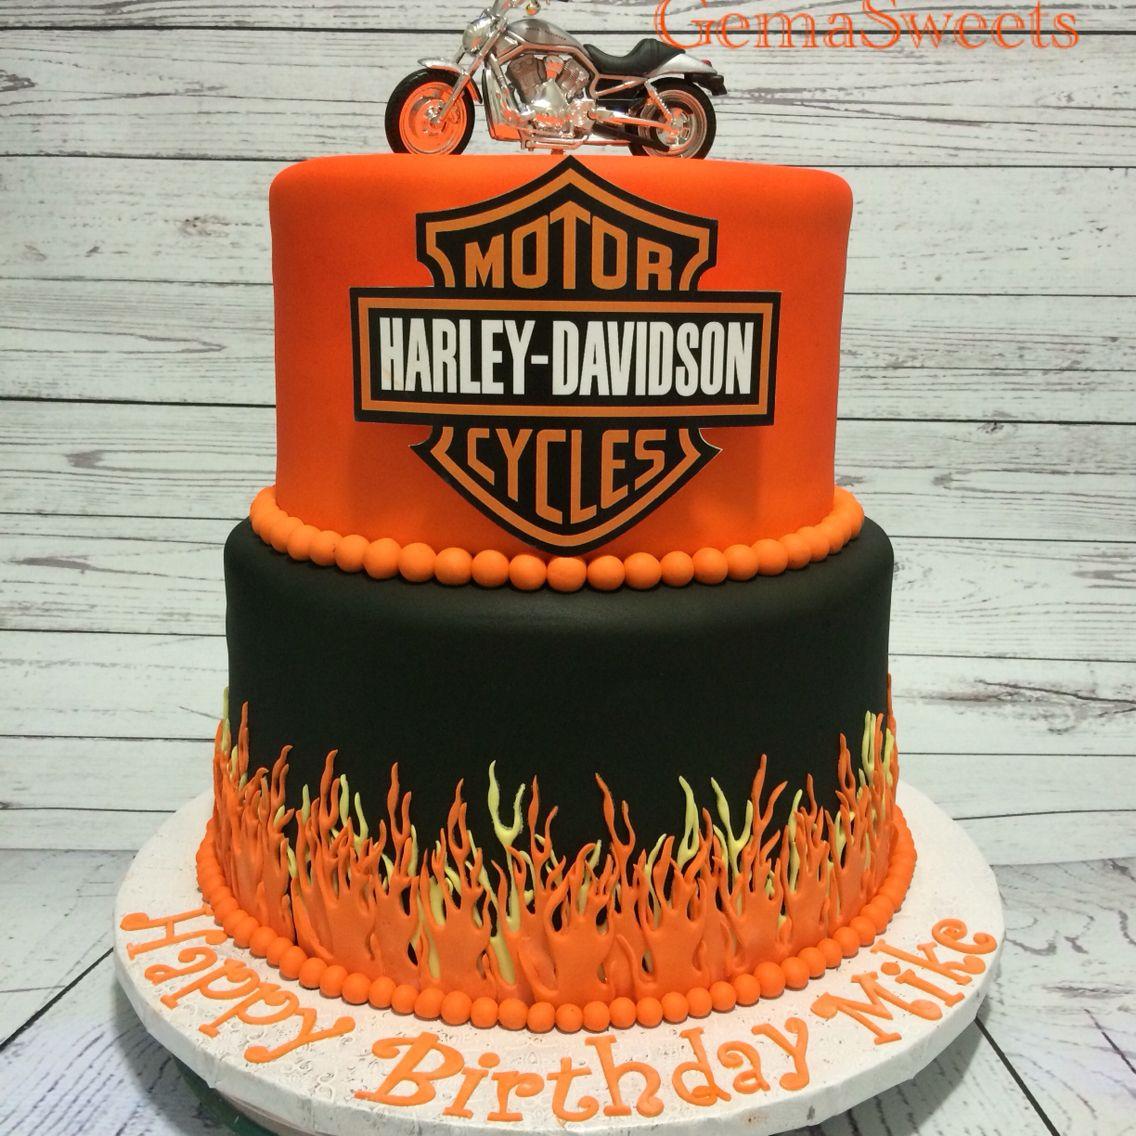 Harley Davidson Inspired Cake By Gema Sweets Harley Davidson Birthday Motorcycle Birthday Cakes Motorcycle Cake